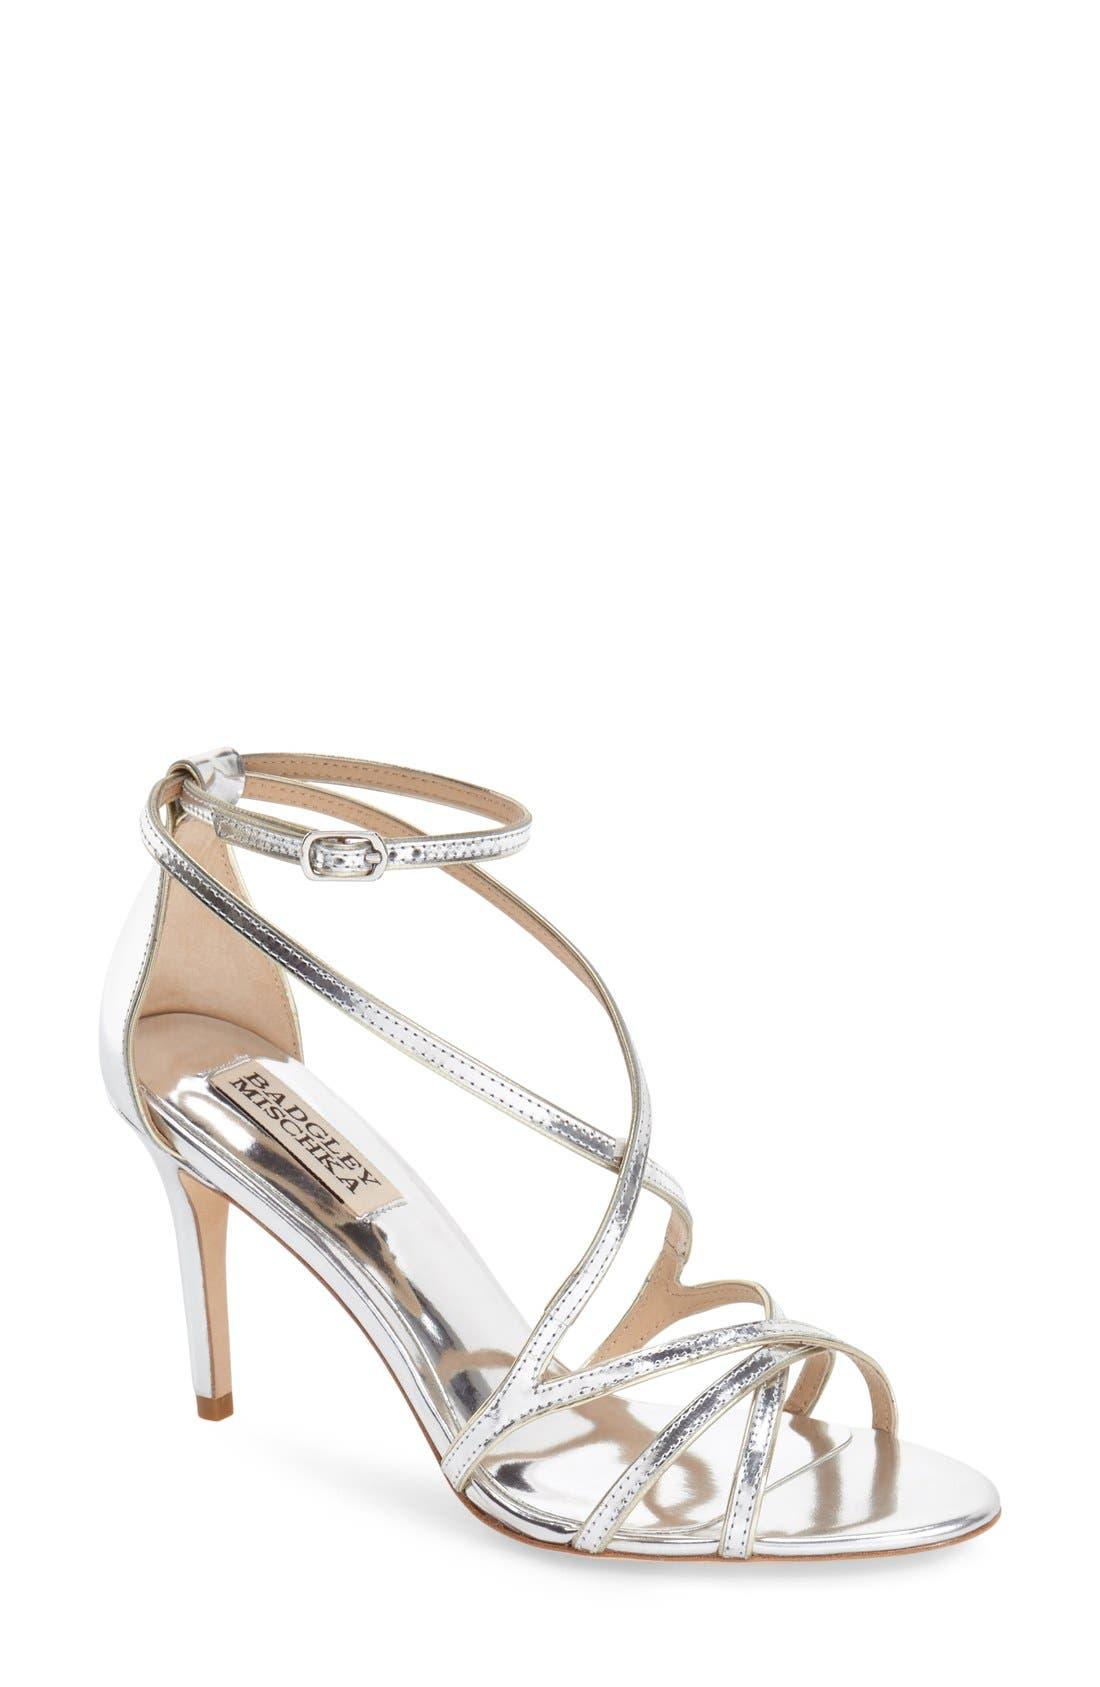 BADGLEY MISCHKA COLLECTION Badgley Mischka 'Lillian' Metallic Evening Sandal, Main, color, 046